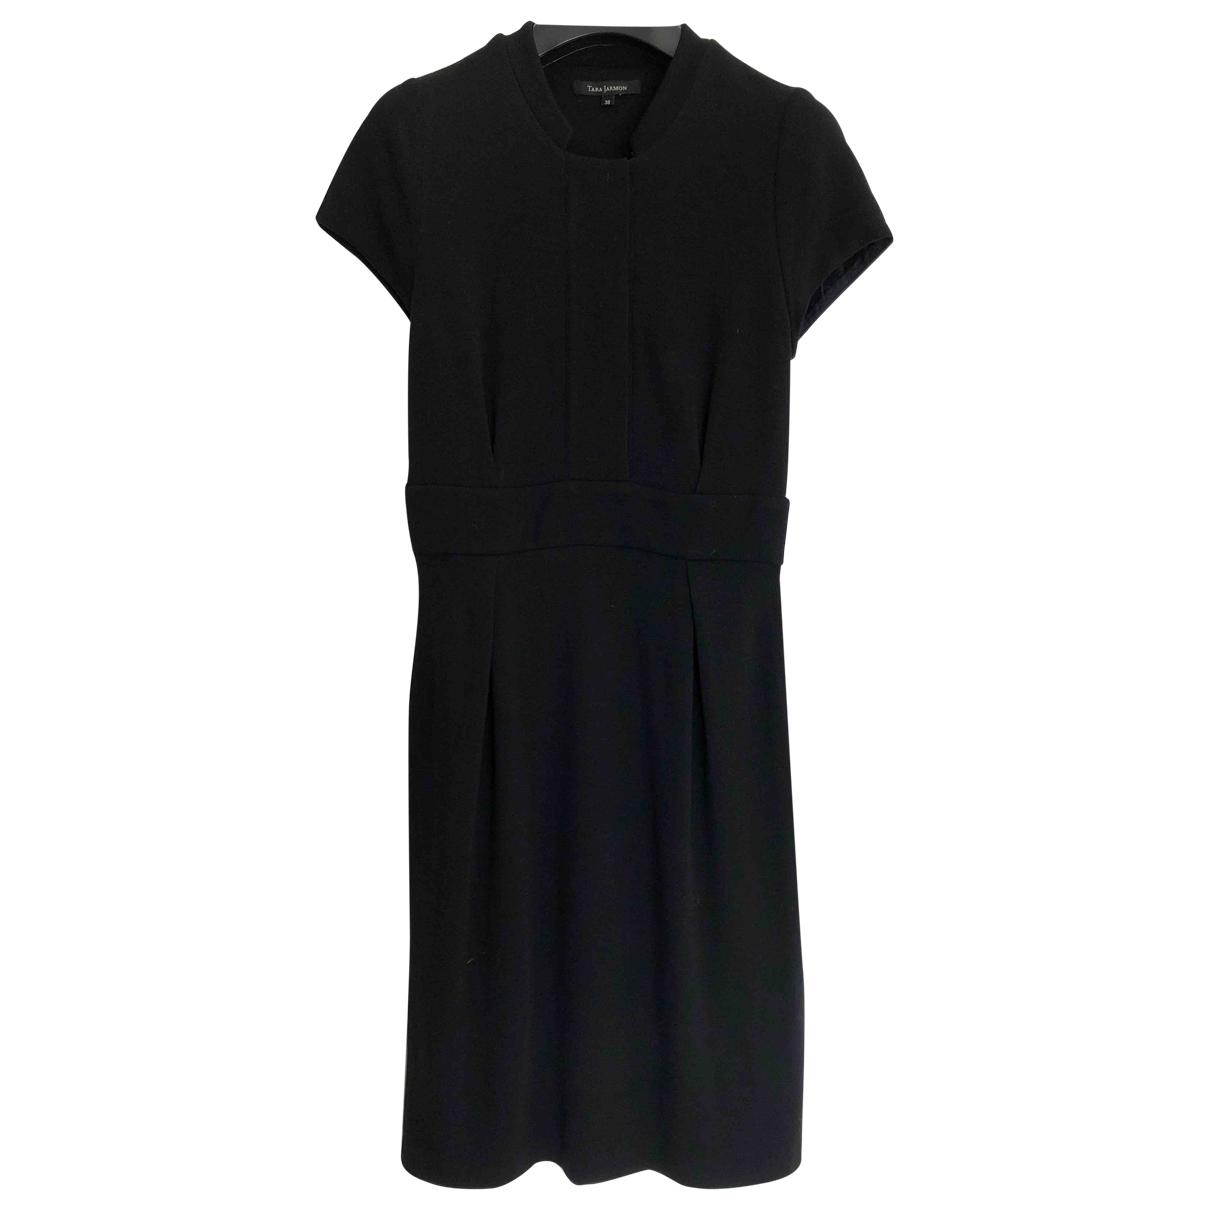 Tara Jarmon \N Black dress for Women 38 FR